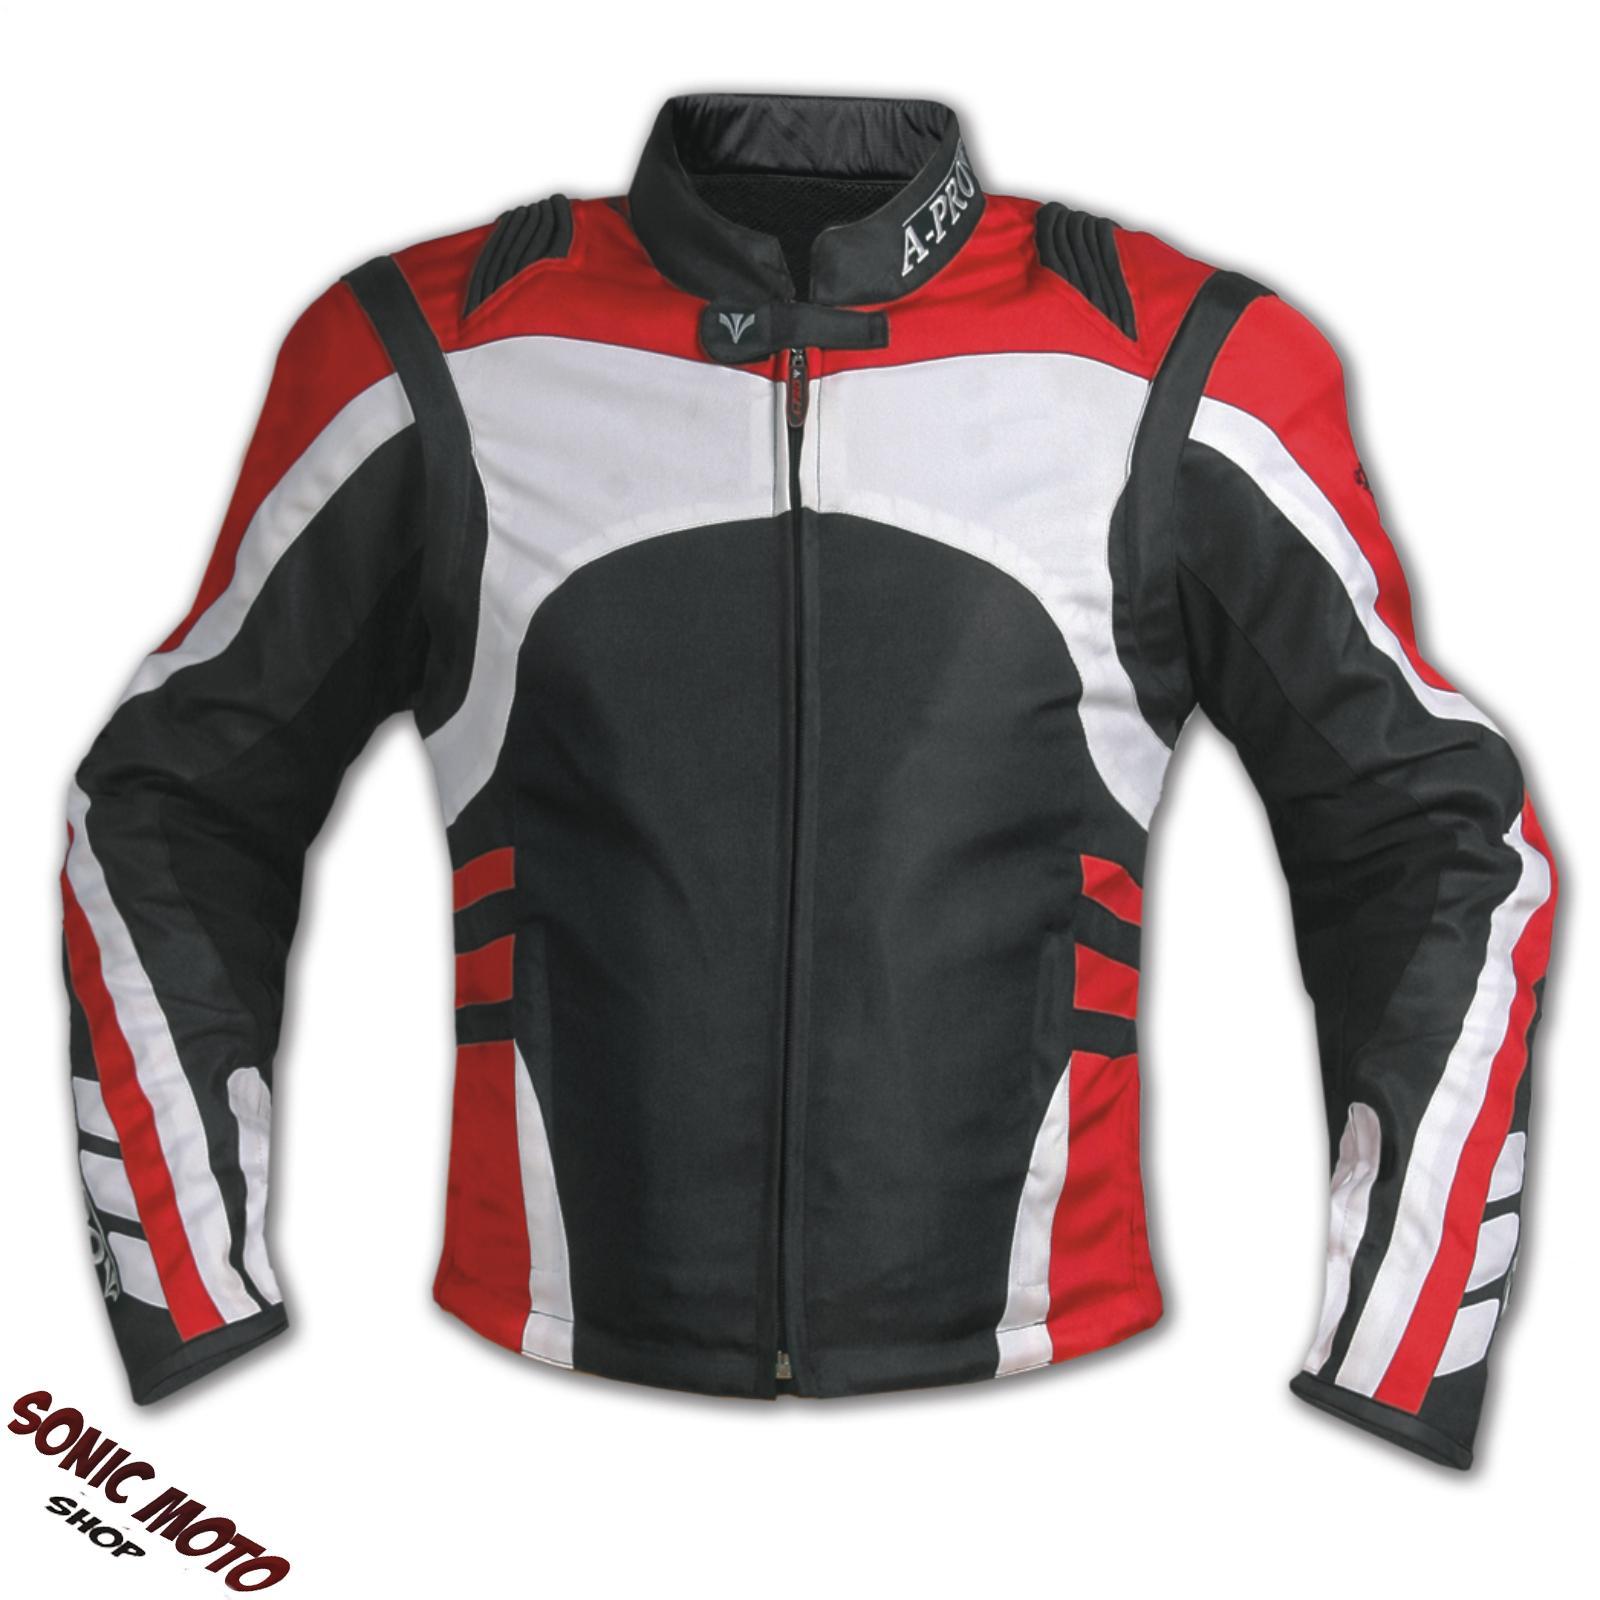 Chaqueta-De-Moto-Textil-Cordura-Manga-Desmontable-Racing-Sport-Berlina-Touring